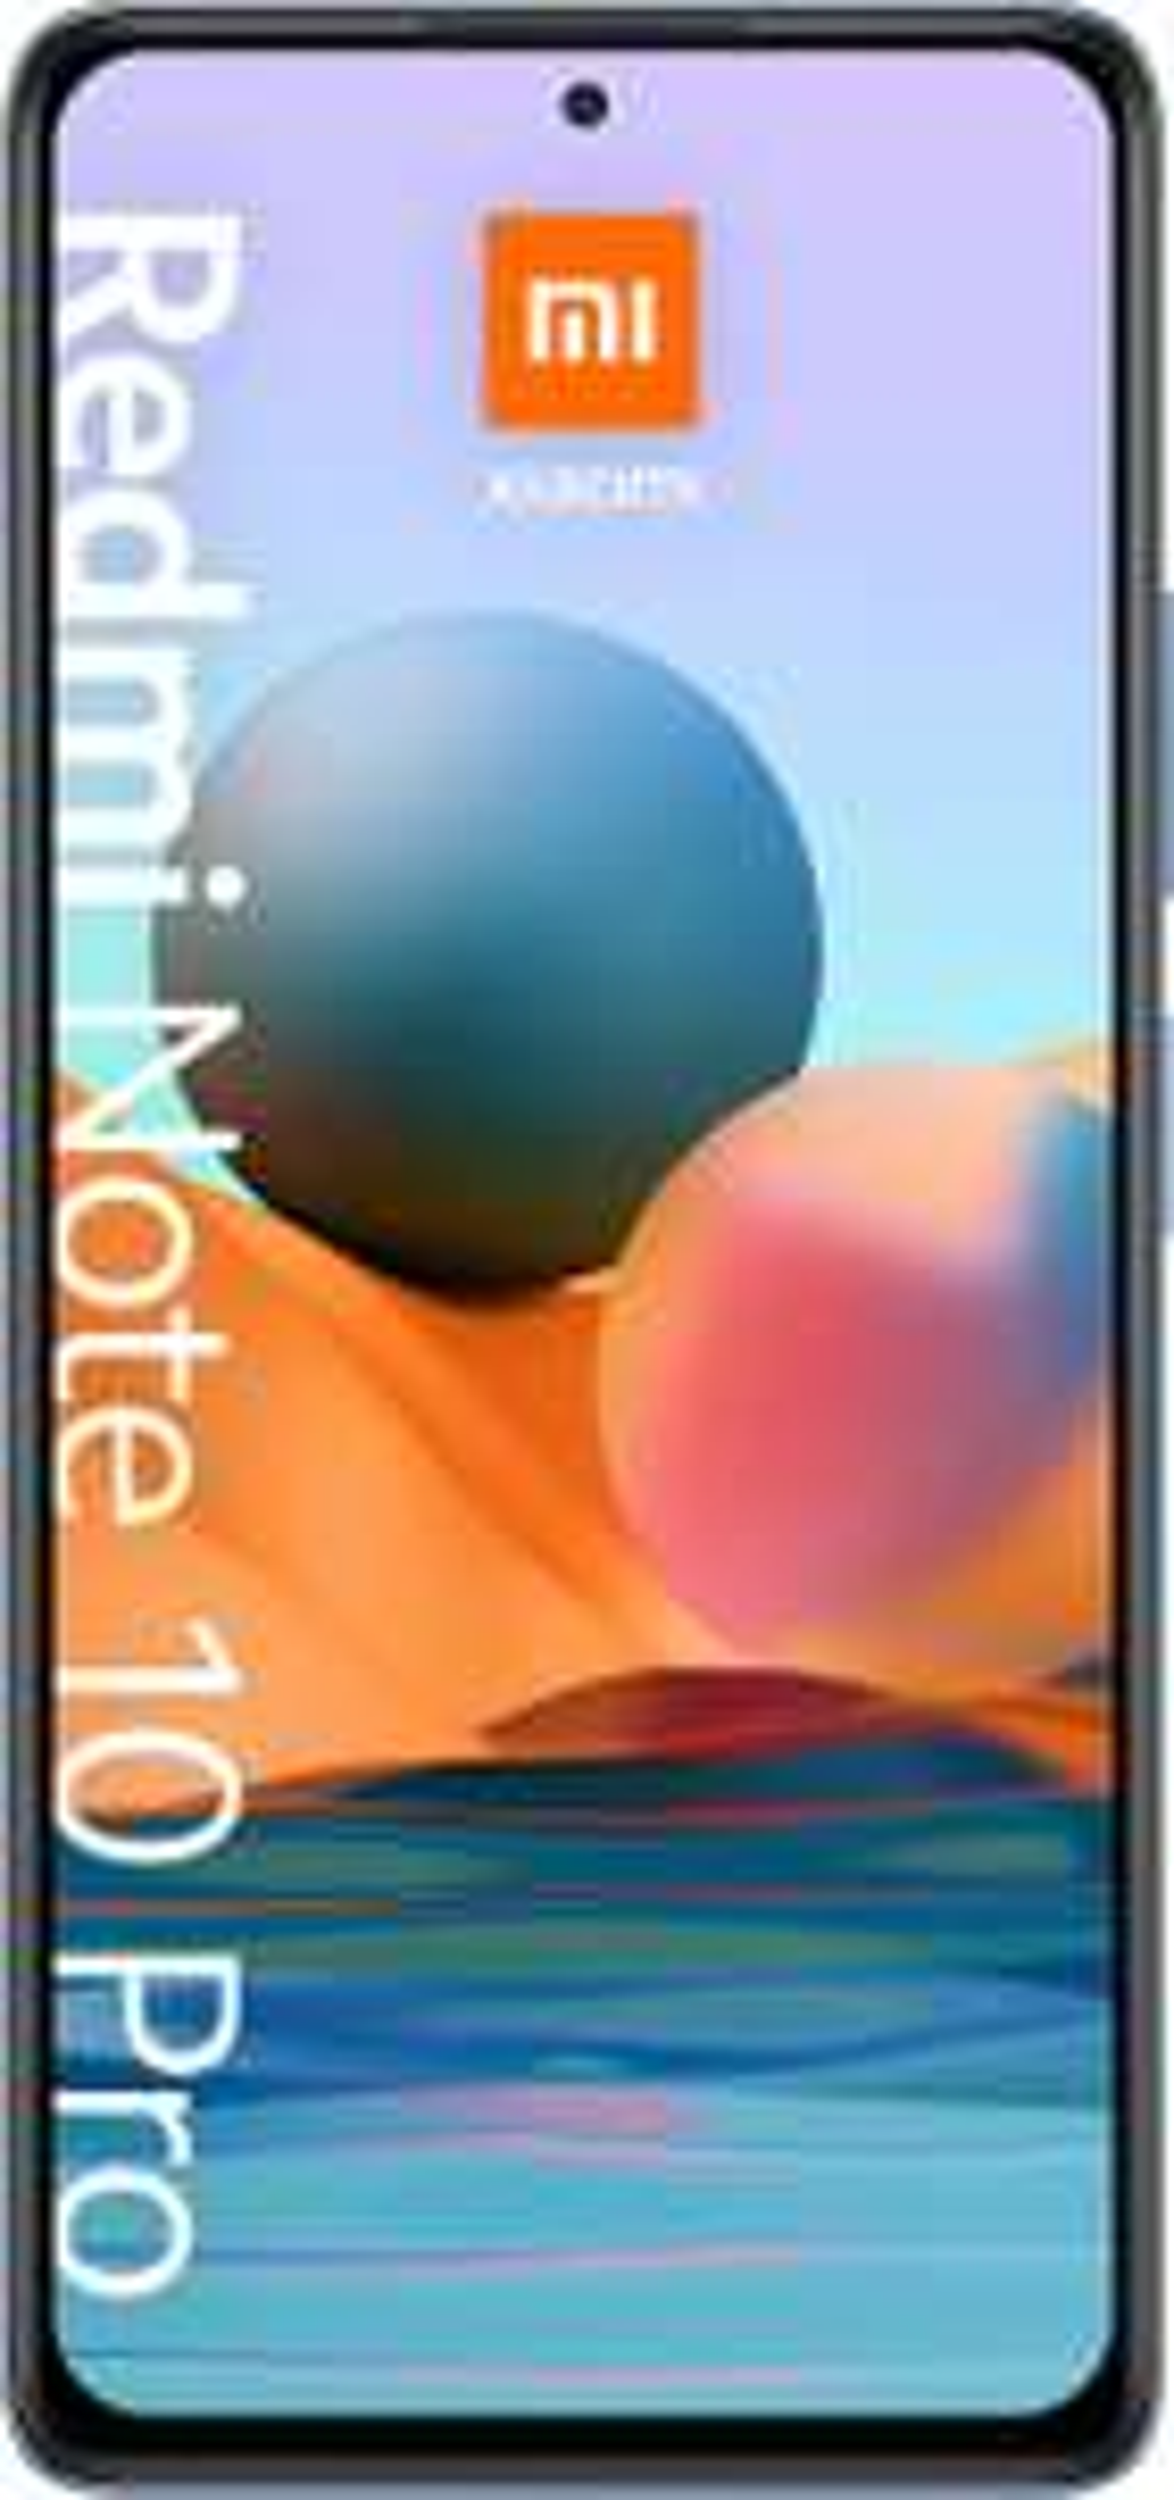 Xiaomi Redmi Note 10 Pro (128 GB) + 30€ Sofortbonus mit 5GB LTE winSIM Tarif für 1€ ZZ & mtl. 15,99€